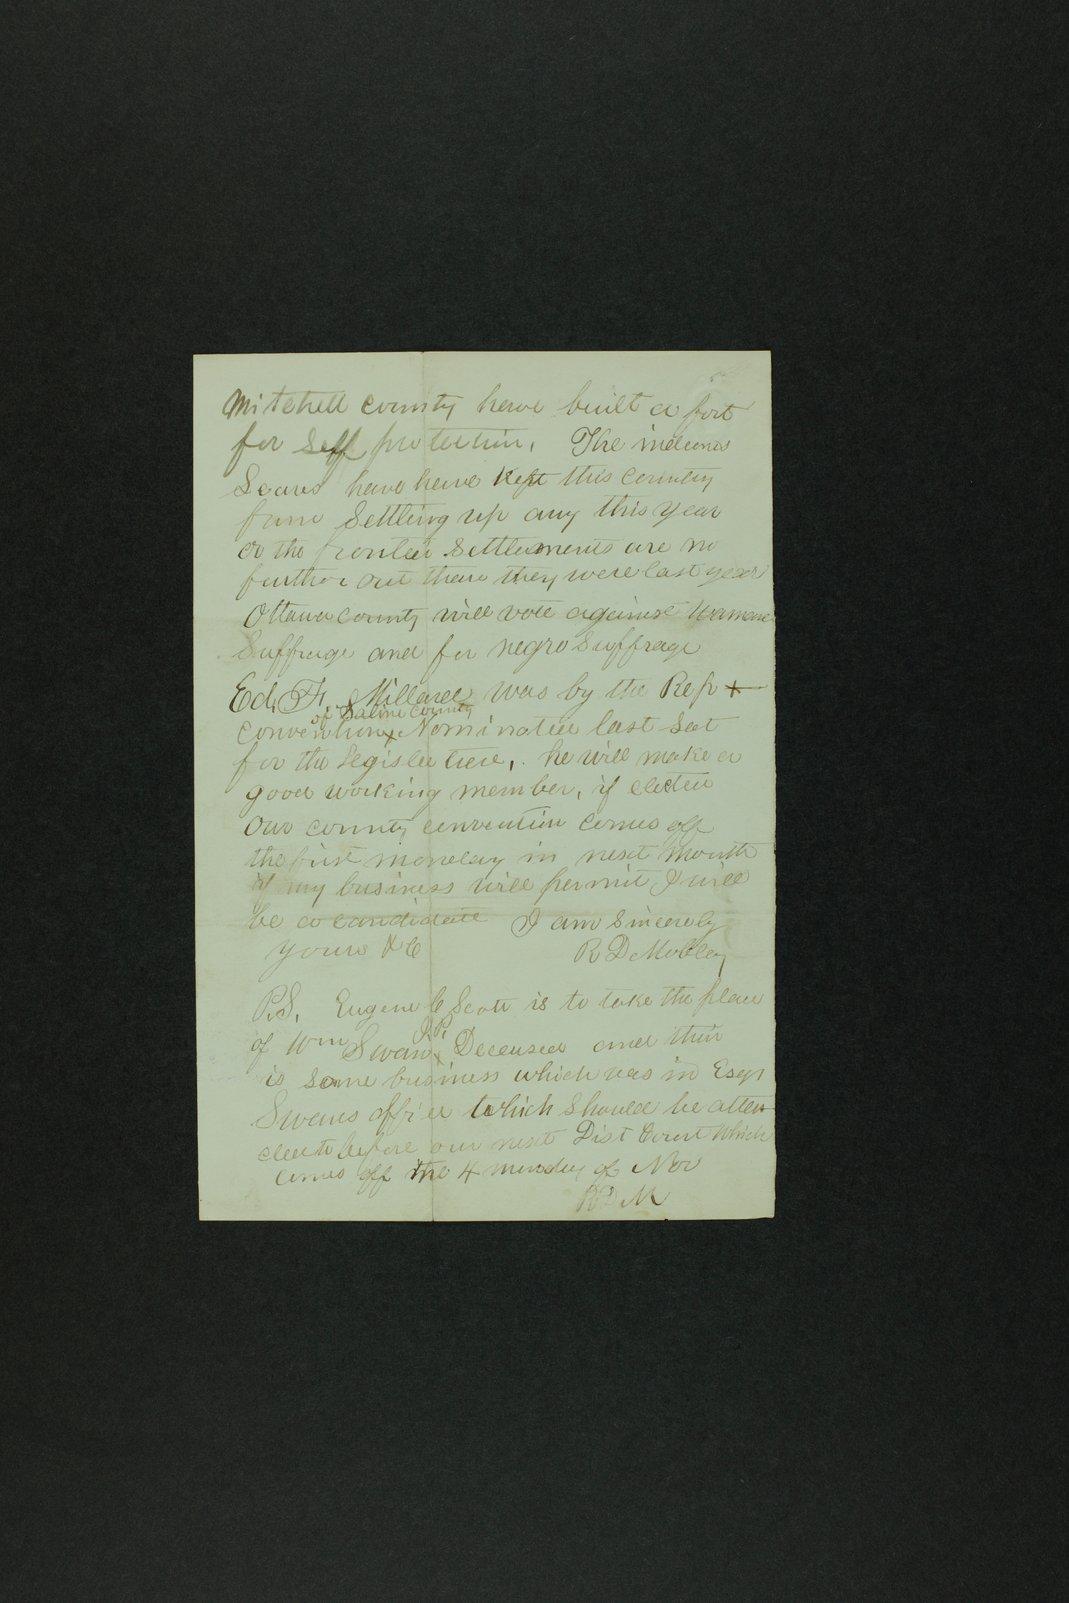 Governor Crawford Indian correspondence - 3